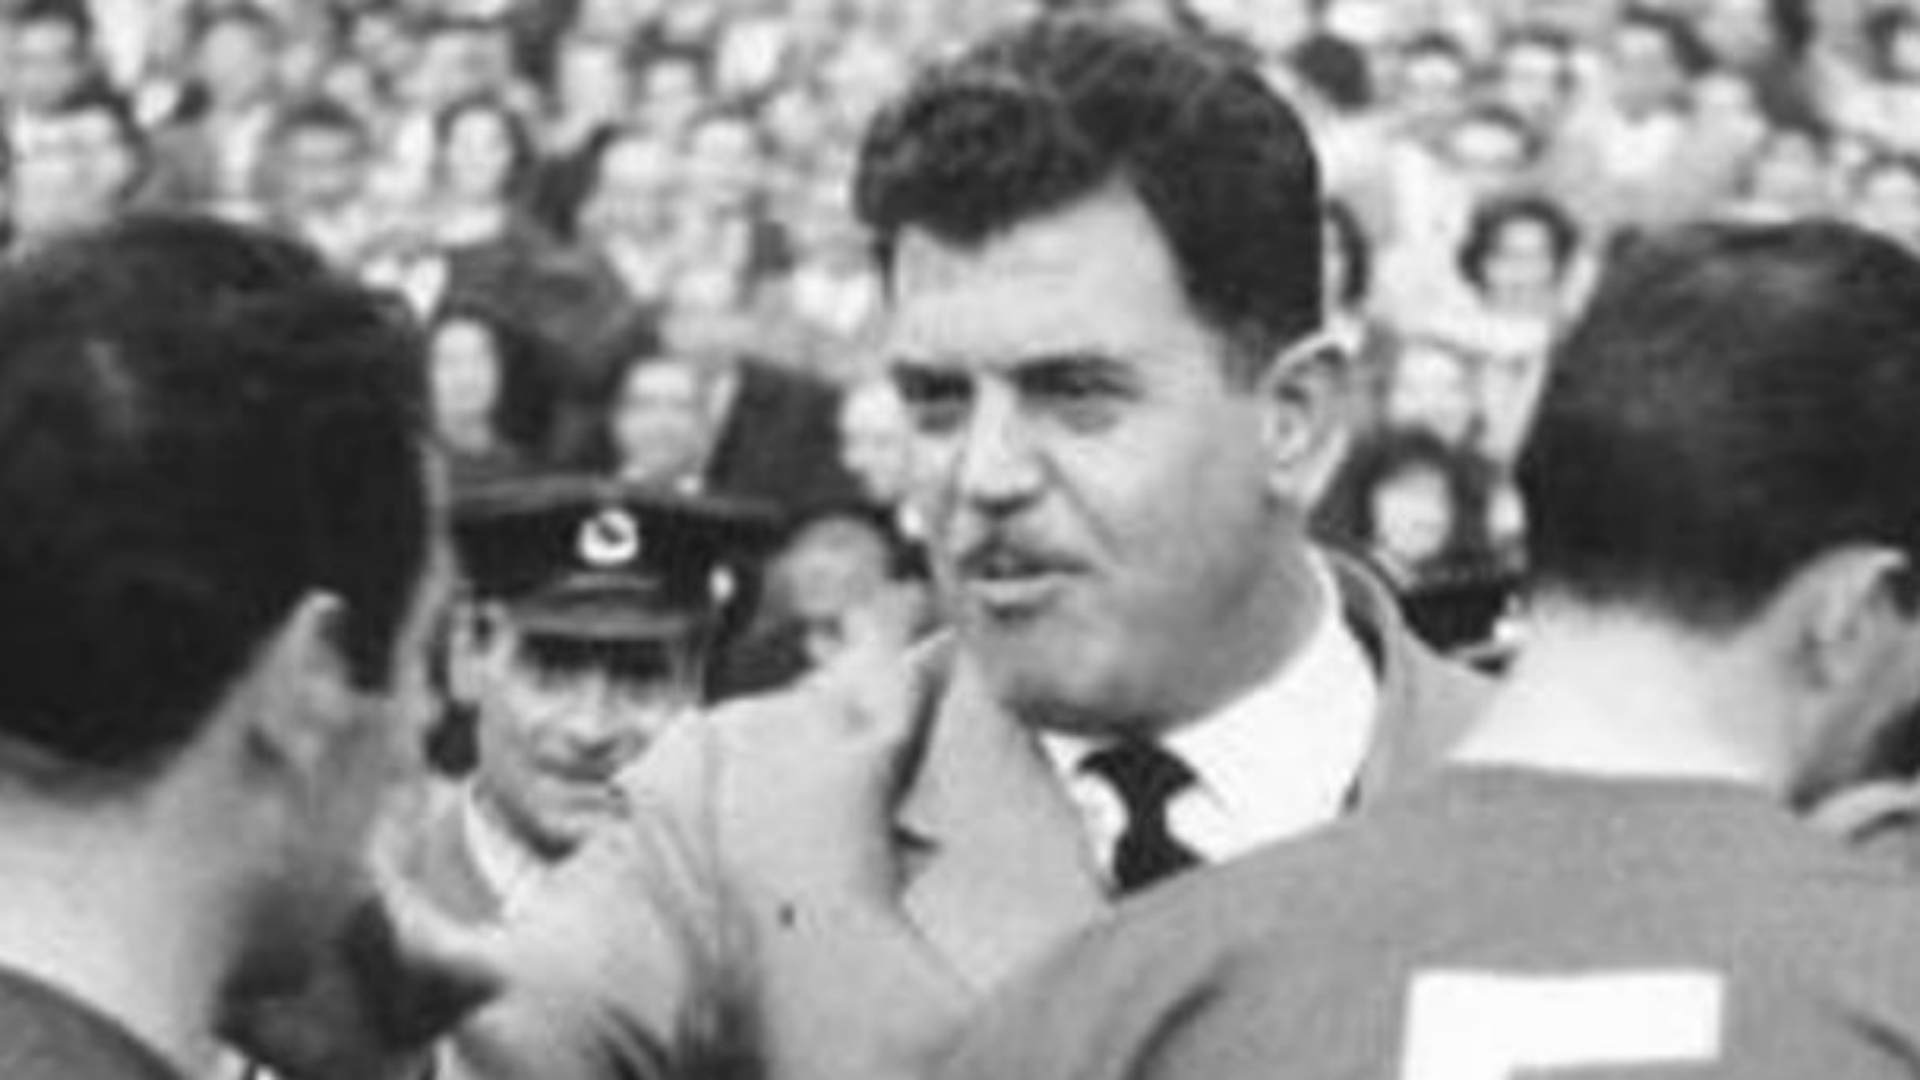 Jose Villalonga ex Real Madrid coach